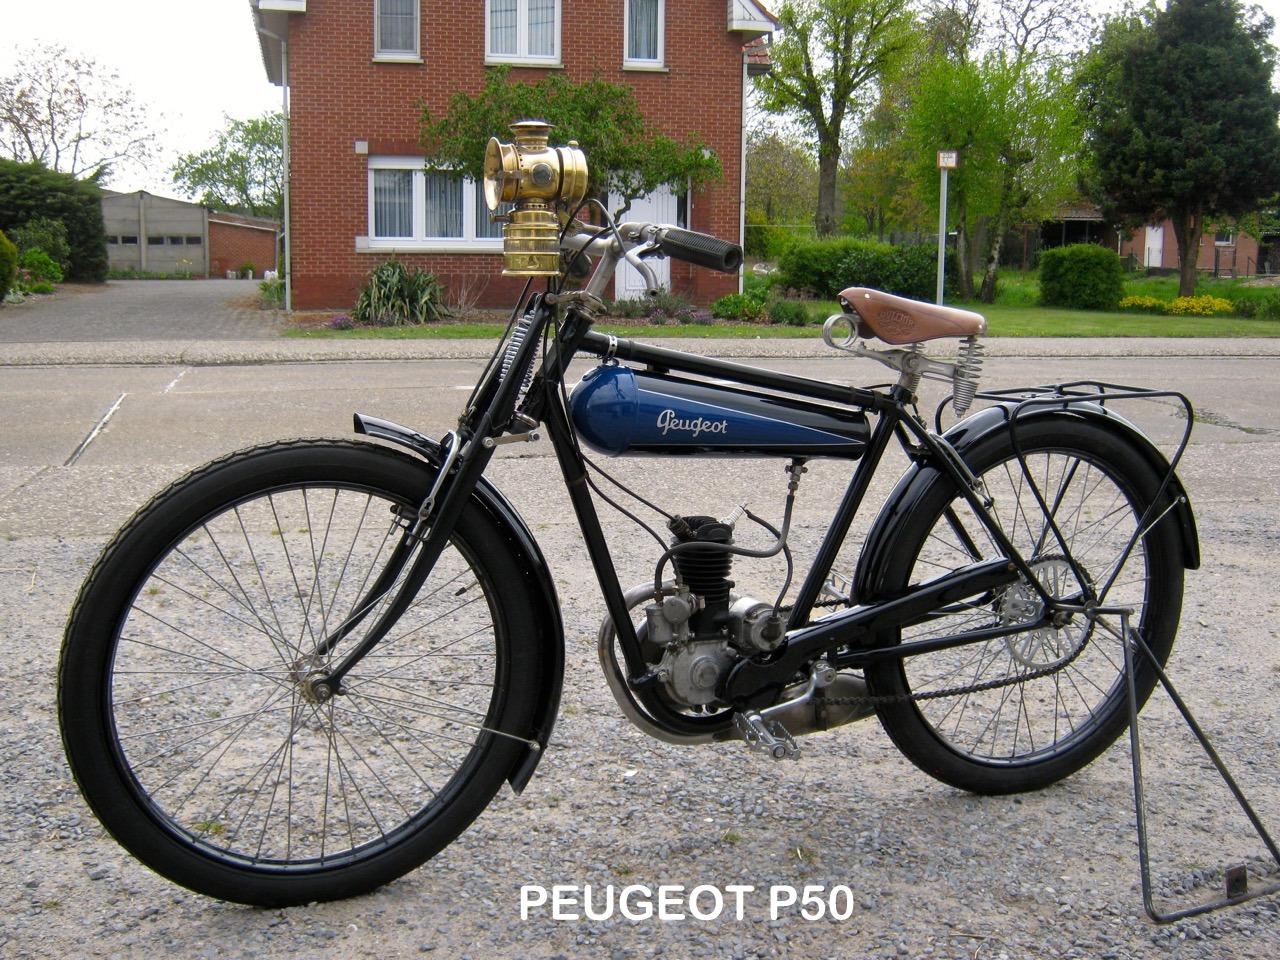 peugeot-p50